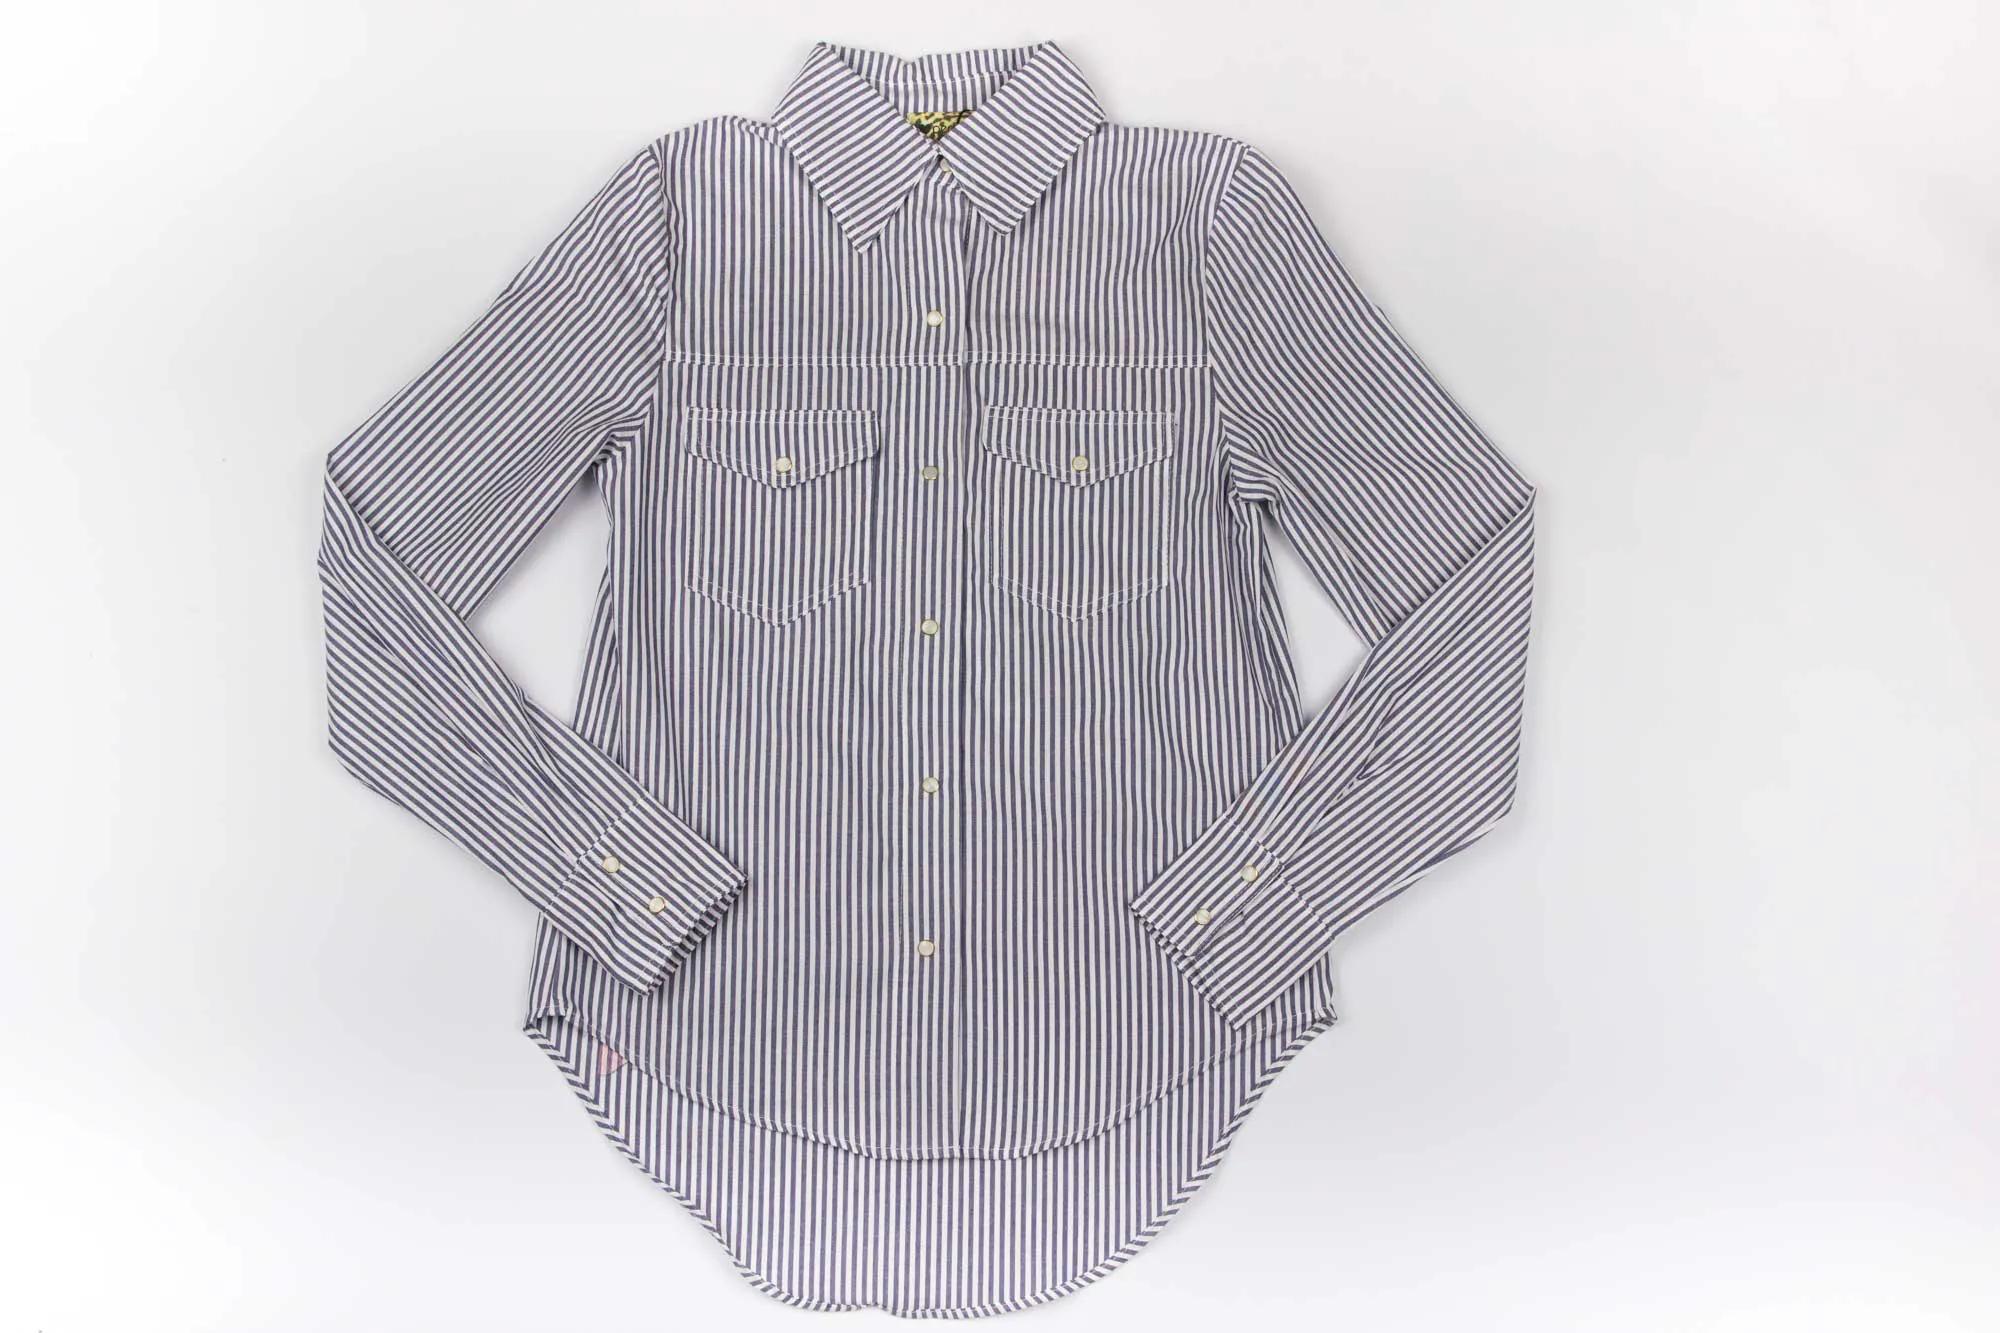 Camisa Tricoline Listrada Serigrafia Perfumaria